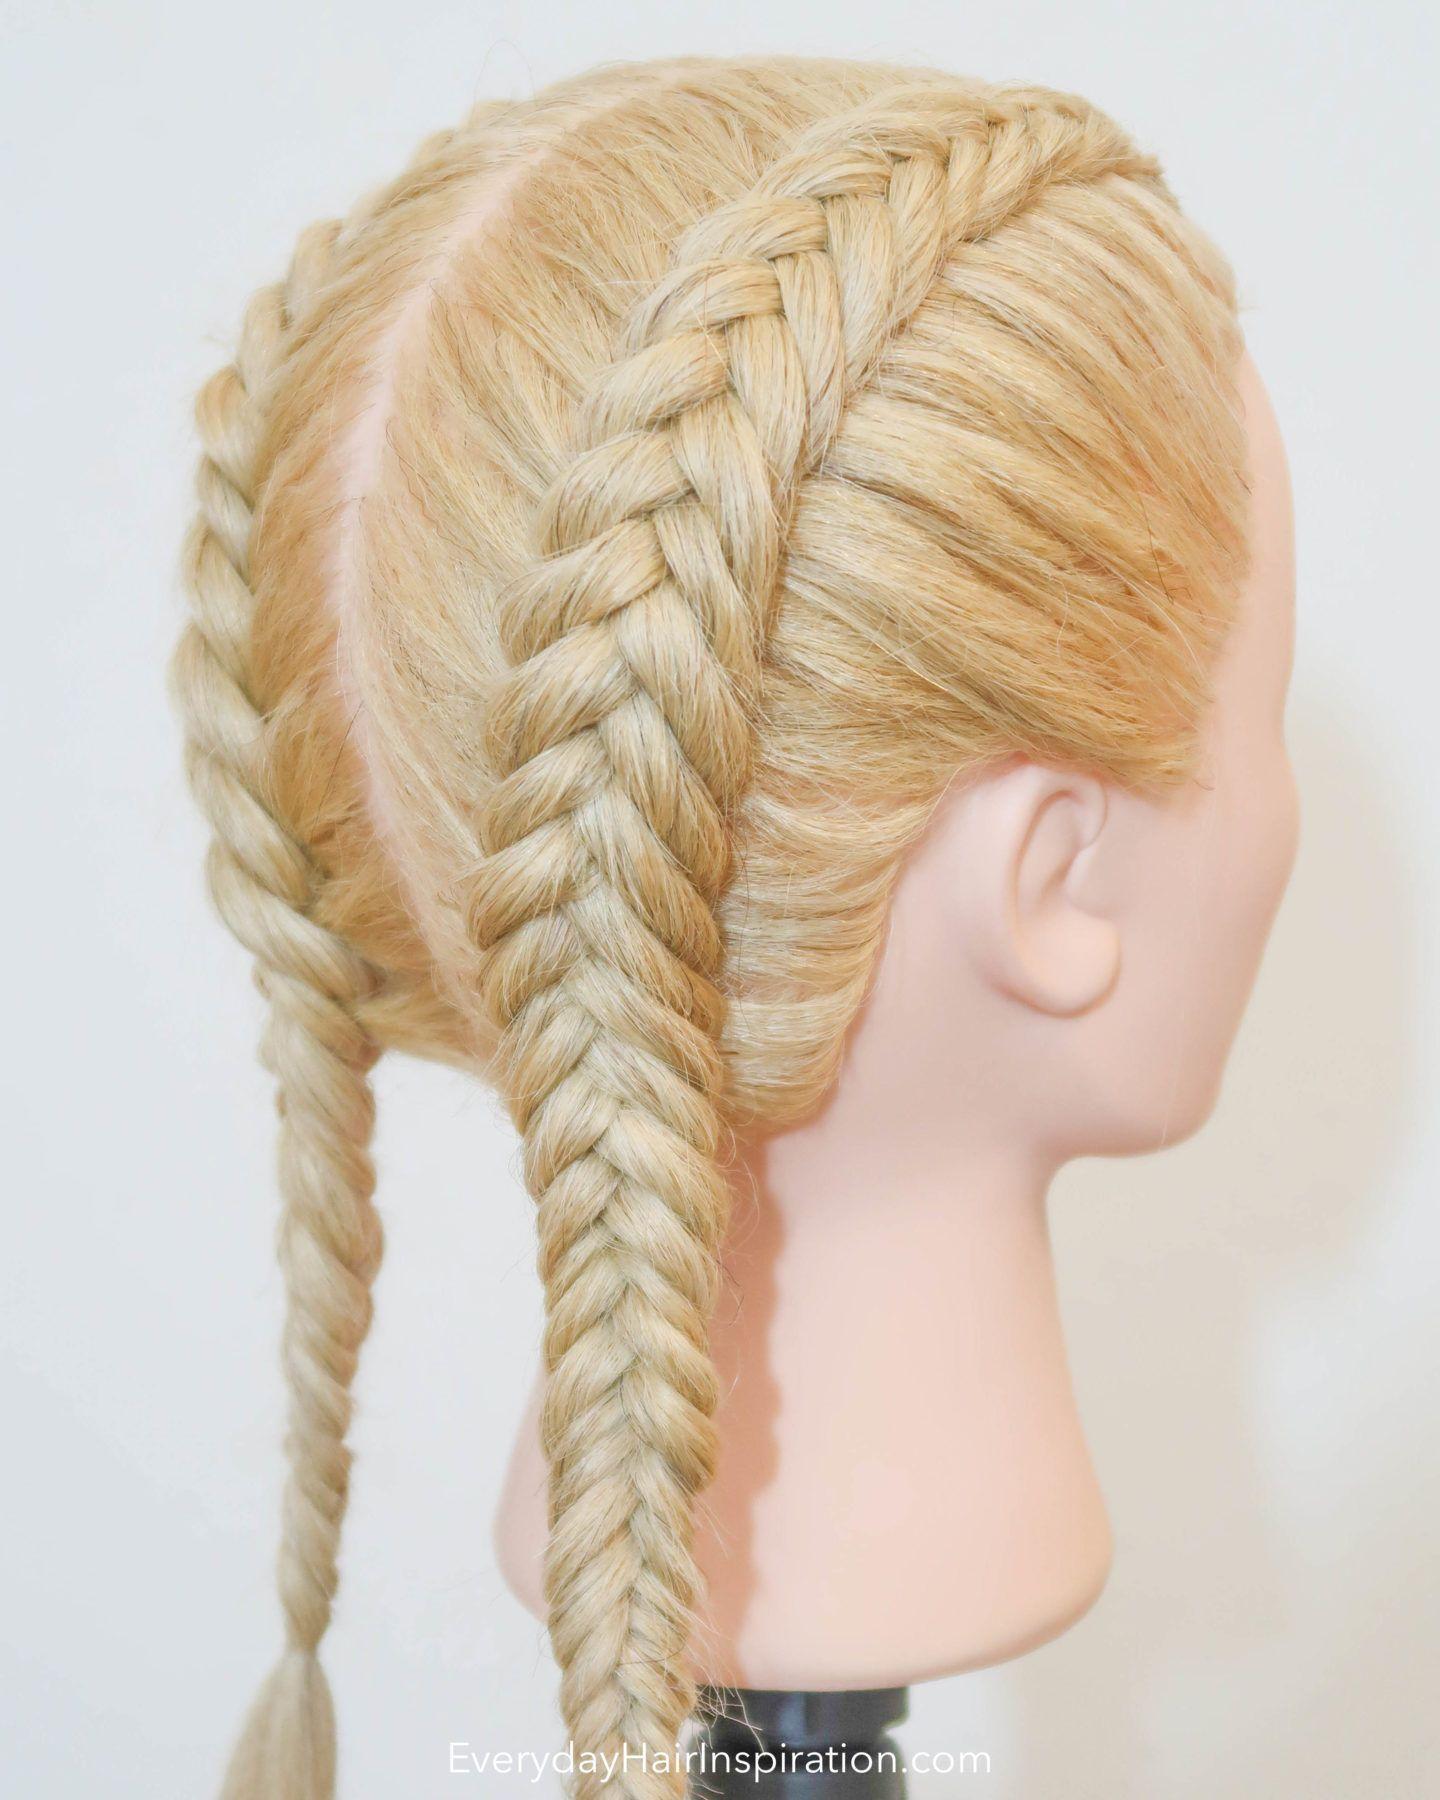 How To Dutch Fishtail Braid For Beginners Everyday Hair Inspiration In 2020 Dutch Fishtail Braid Fish Tail Braid Long Hair Wedding Styles